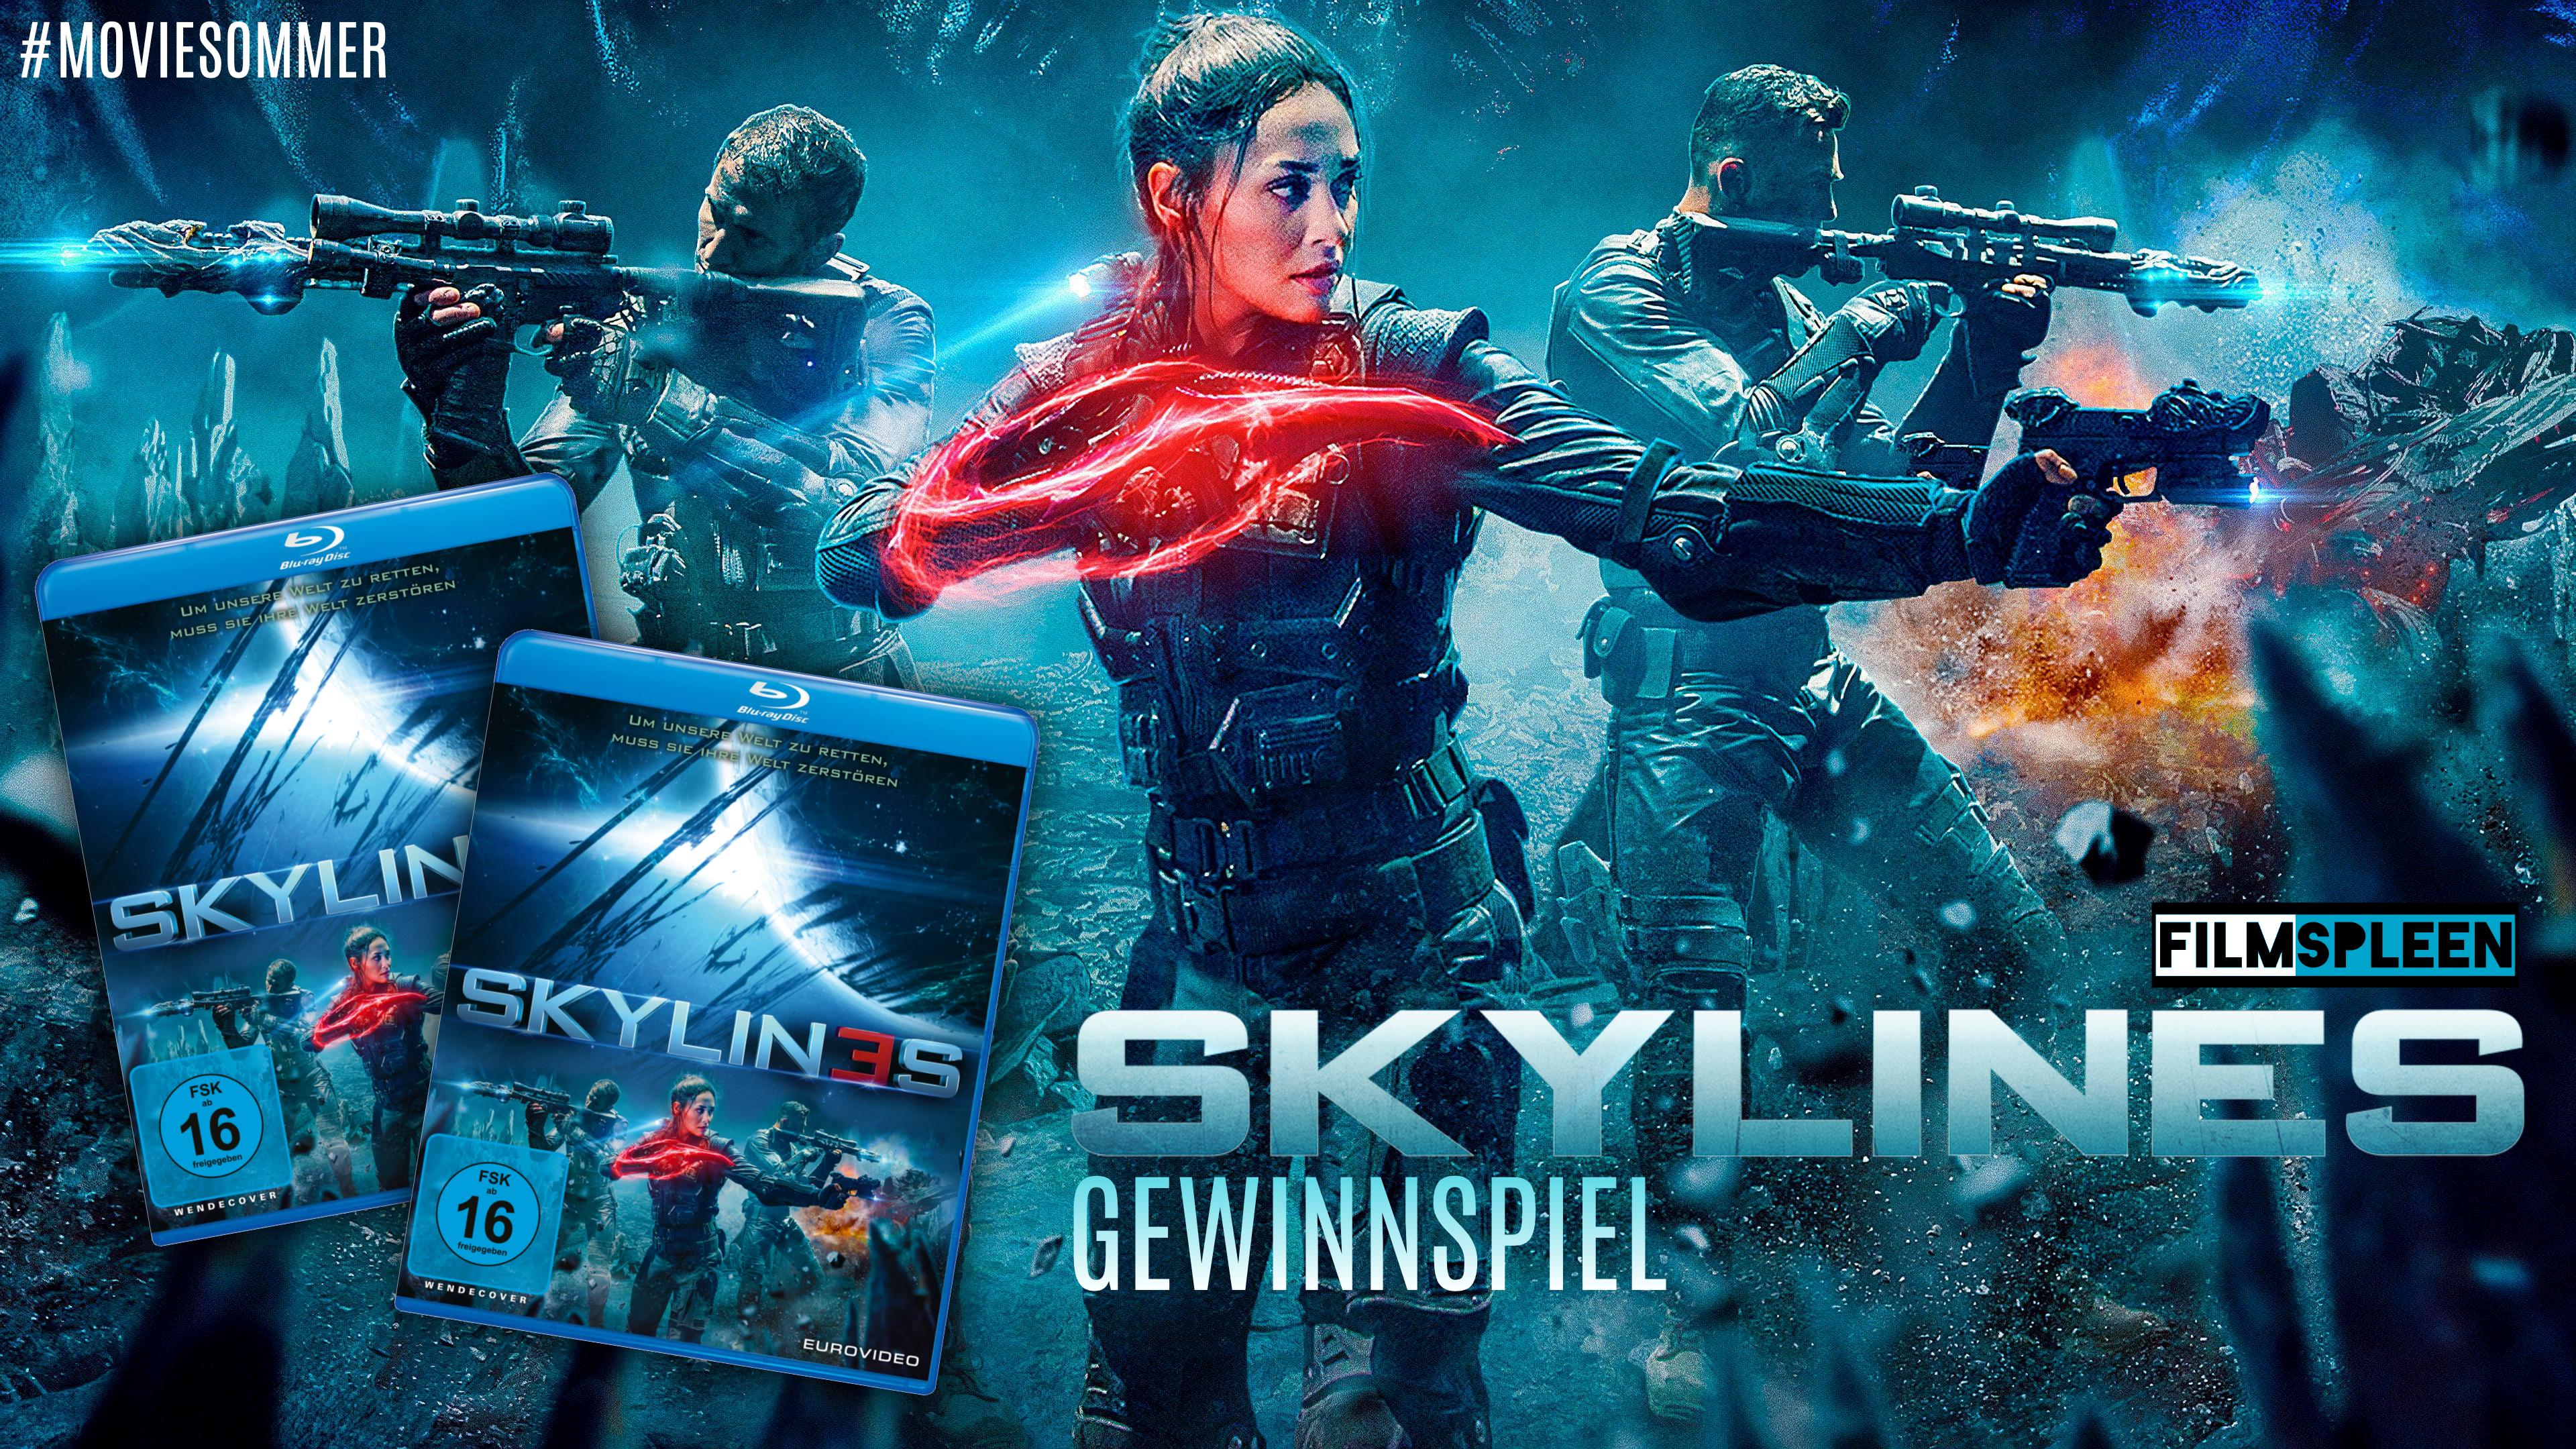 SKYLINES_GWS